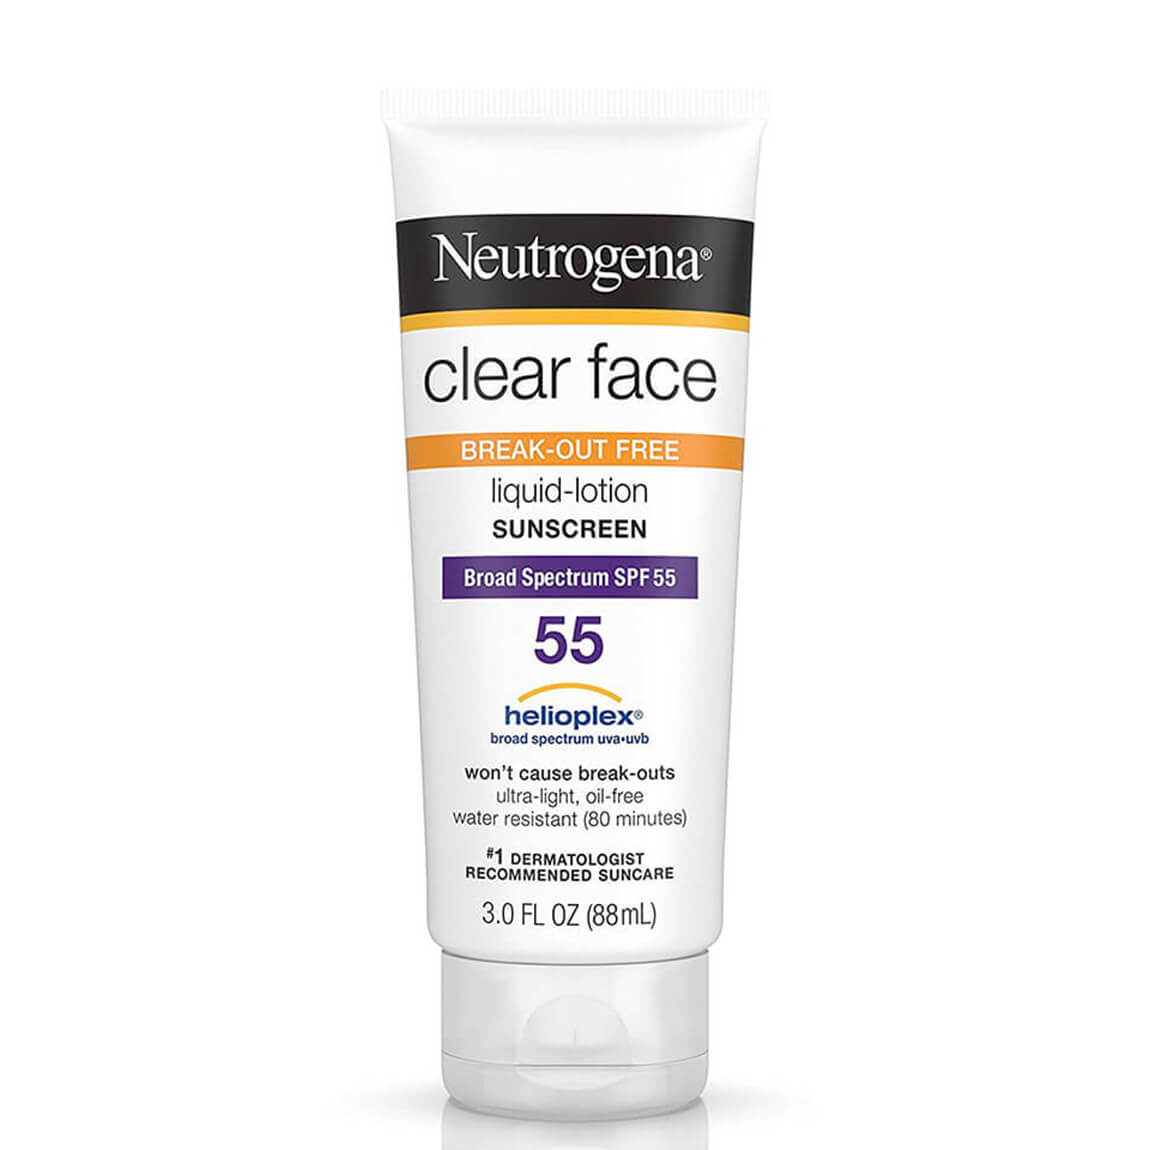 Neutrogena Clear Face Sunscreen For Acne-Prone Skin